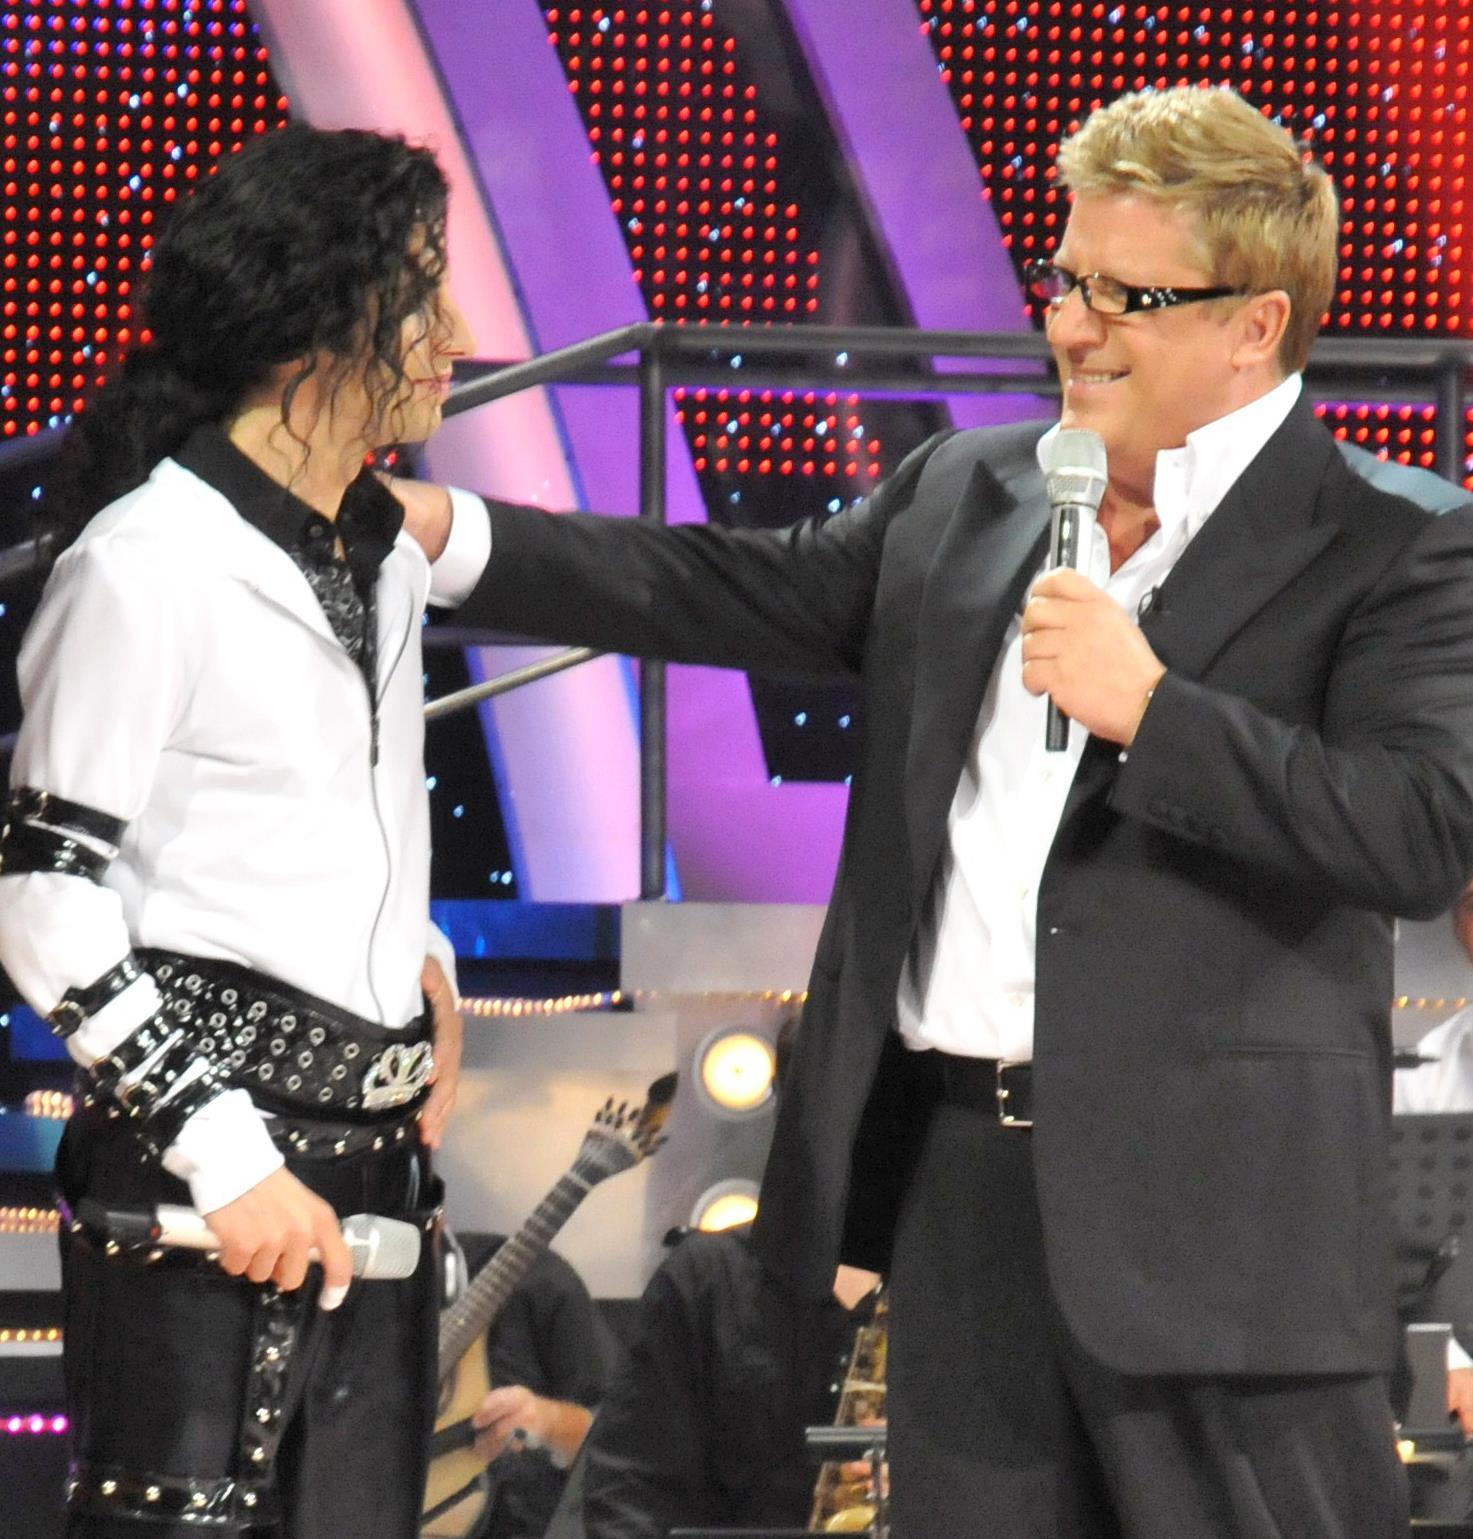 Delfim Miranda - Michael Jackson Tribute - With Herman José - Number One TV Entertainer in Portugal